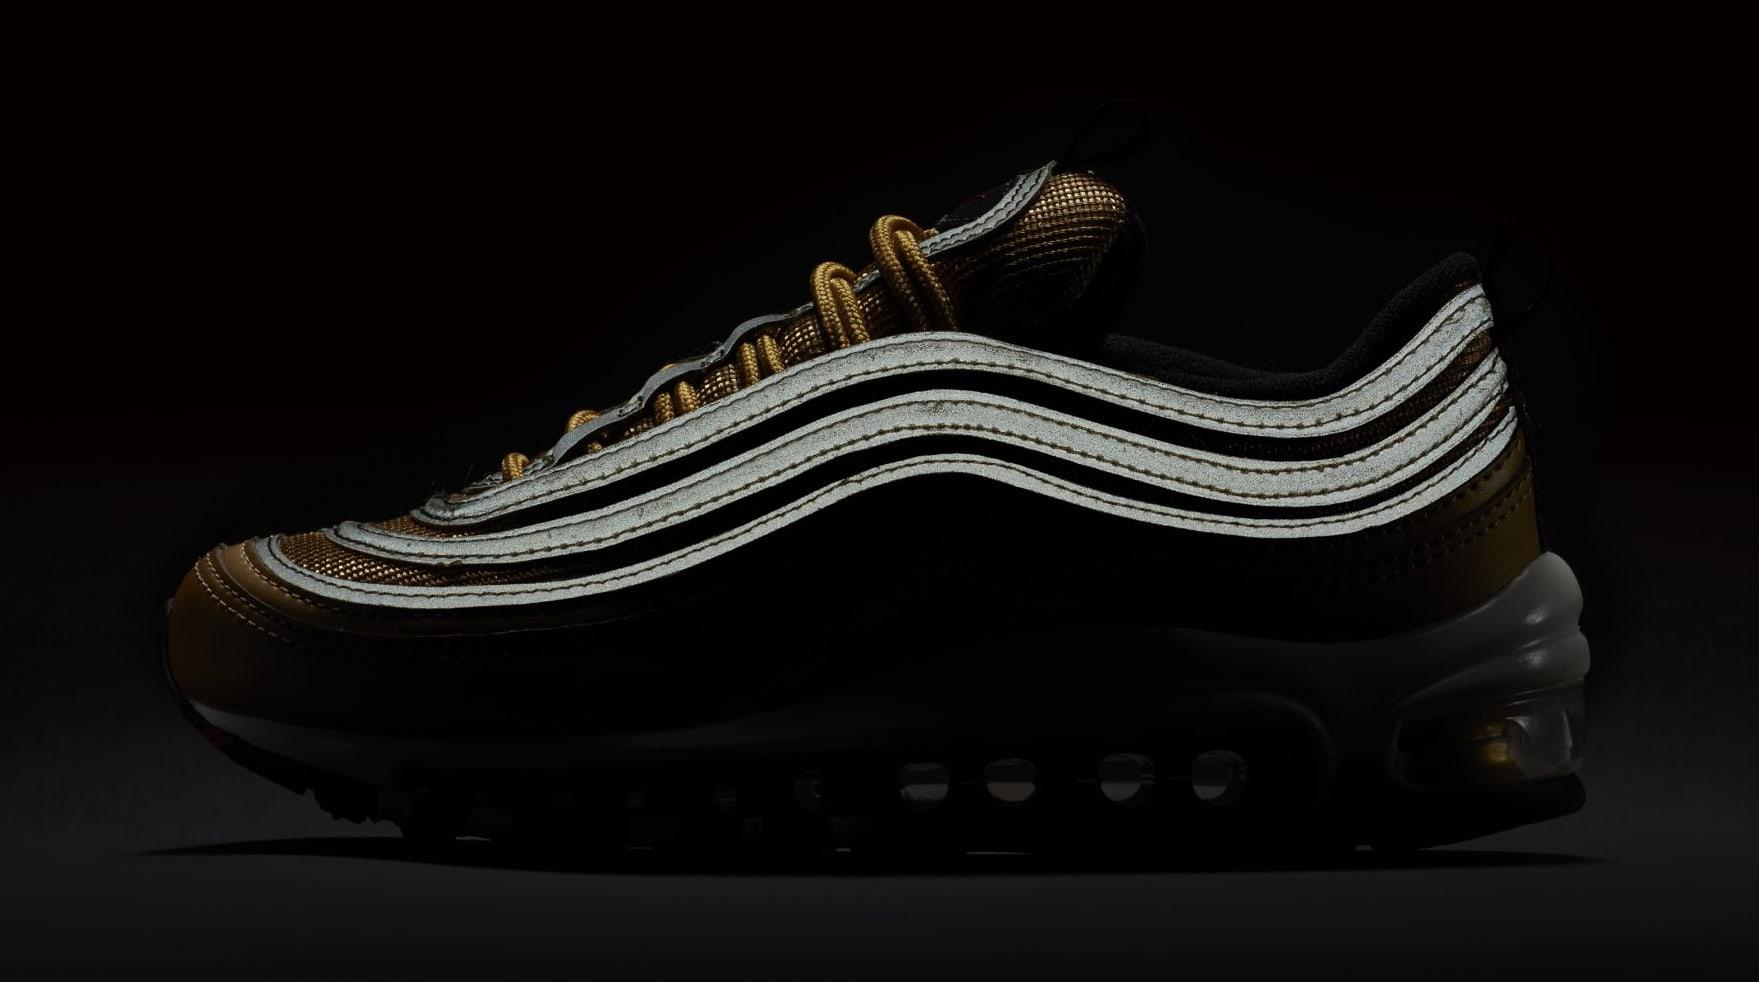 Sneakers Nike Air Max 97 Kendrick Lamar in Loyalty ft Rihanna ab808d9ff